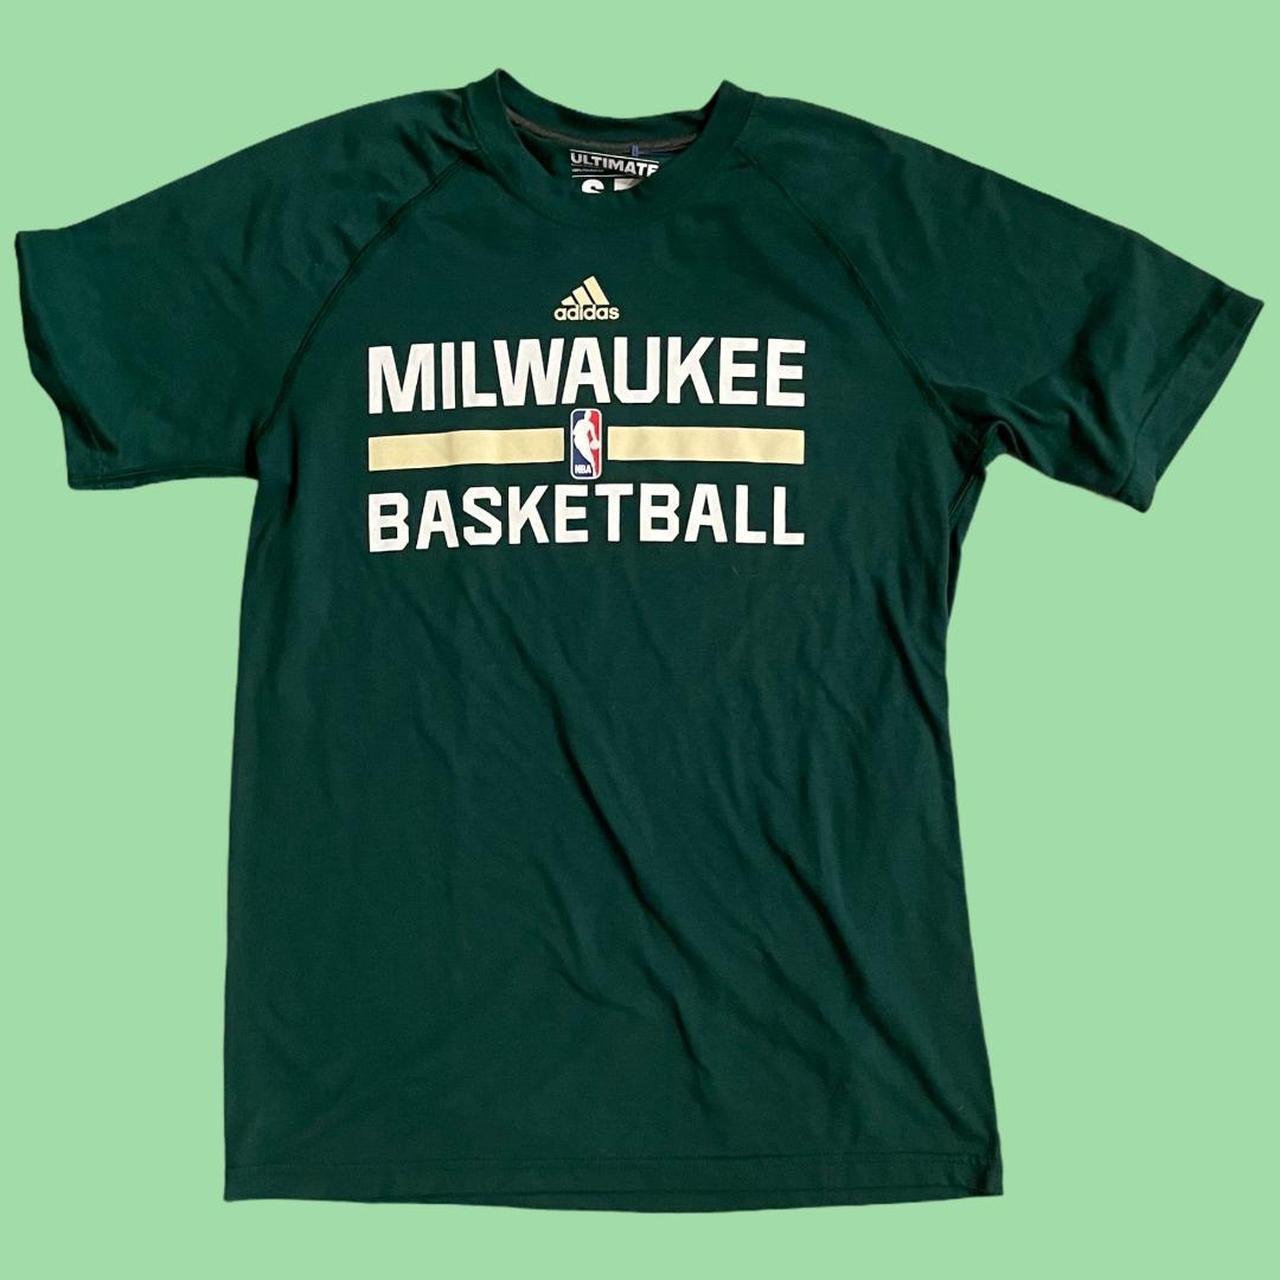 Product Image 1 - Adidas Milwaukee Bucks Basketball tee.